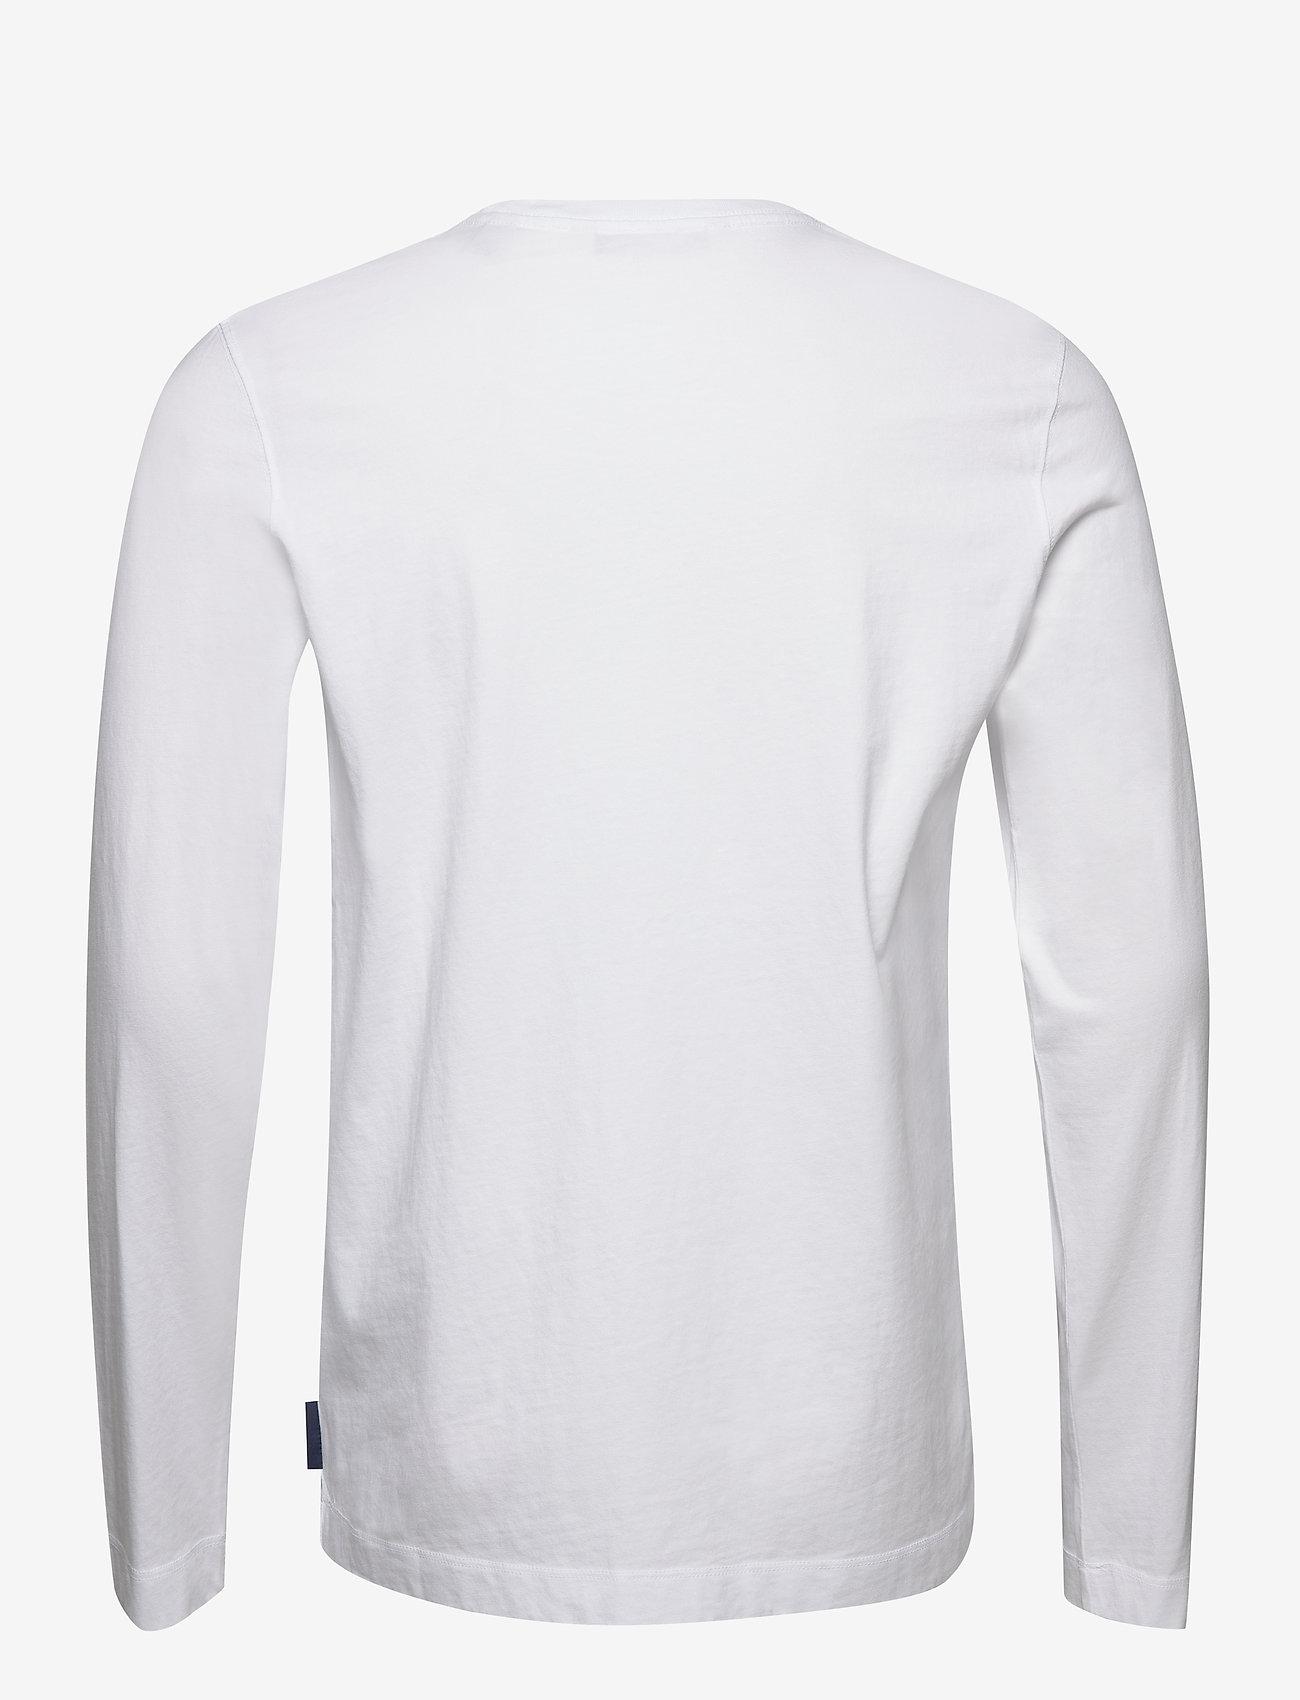 Scotch & Soda - Organic cotton longsleeve tee with chest artwork - basic t-shirts - white - 1